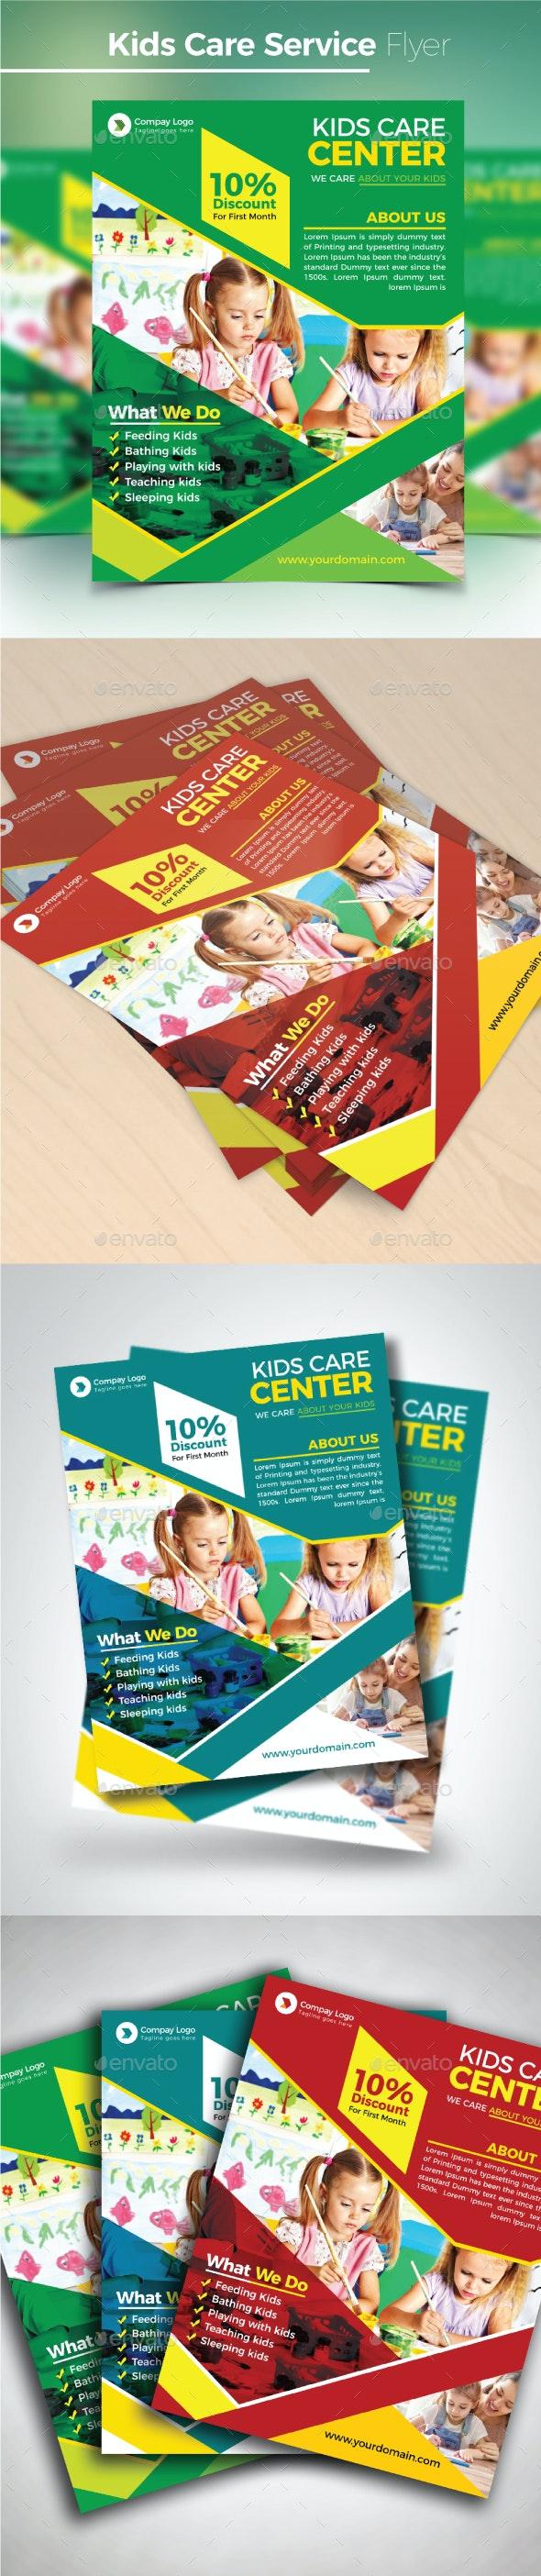 Kids Care Service Flyer - Commerce Flyers